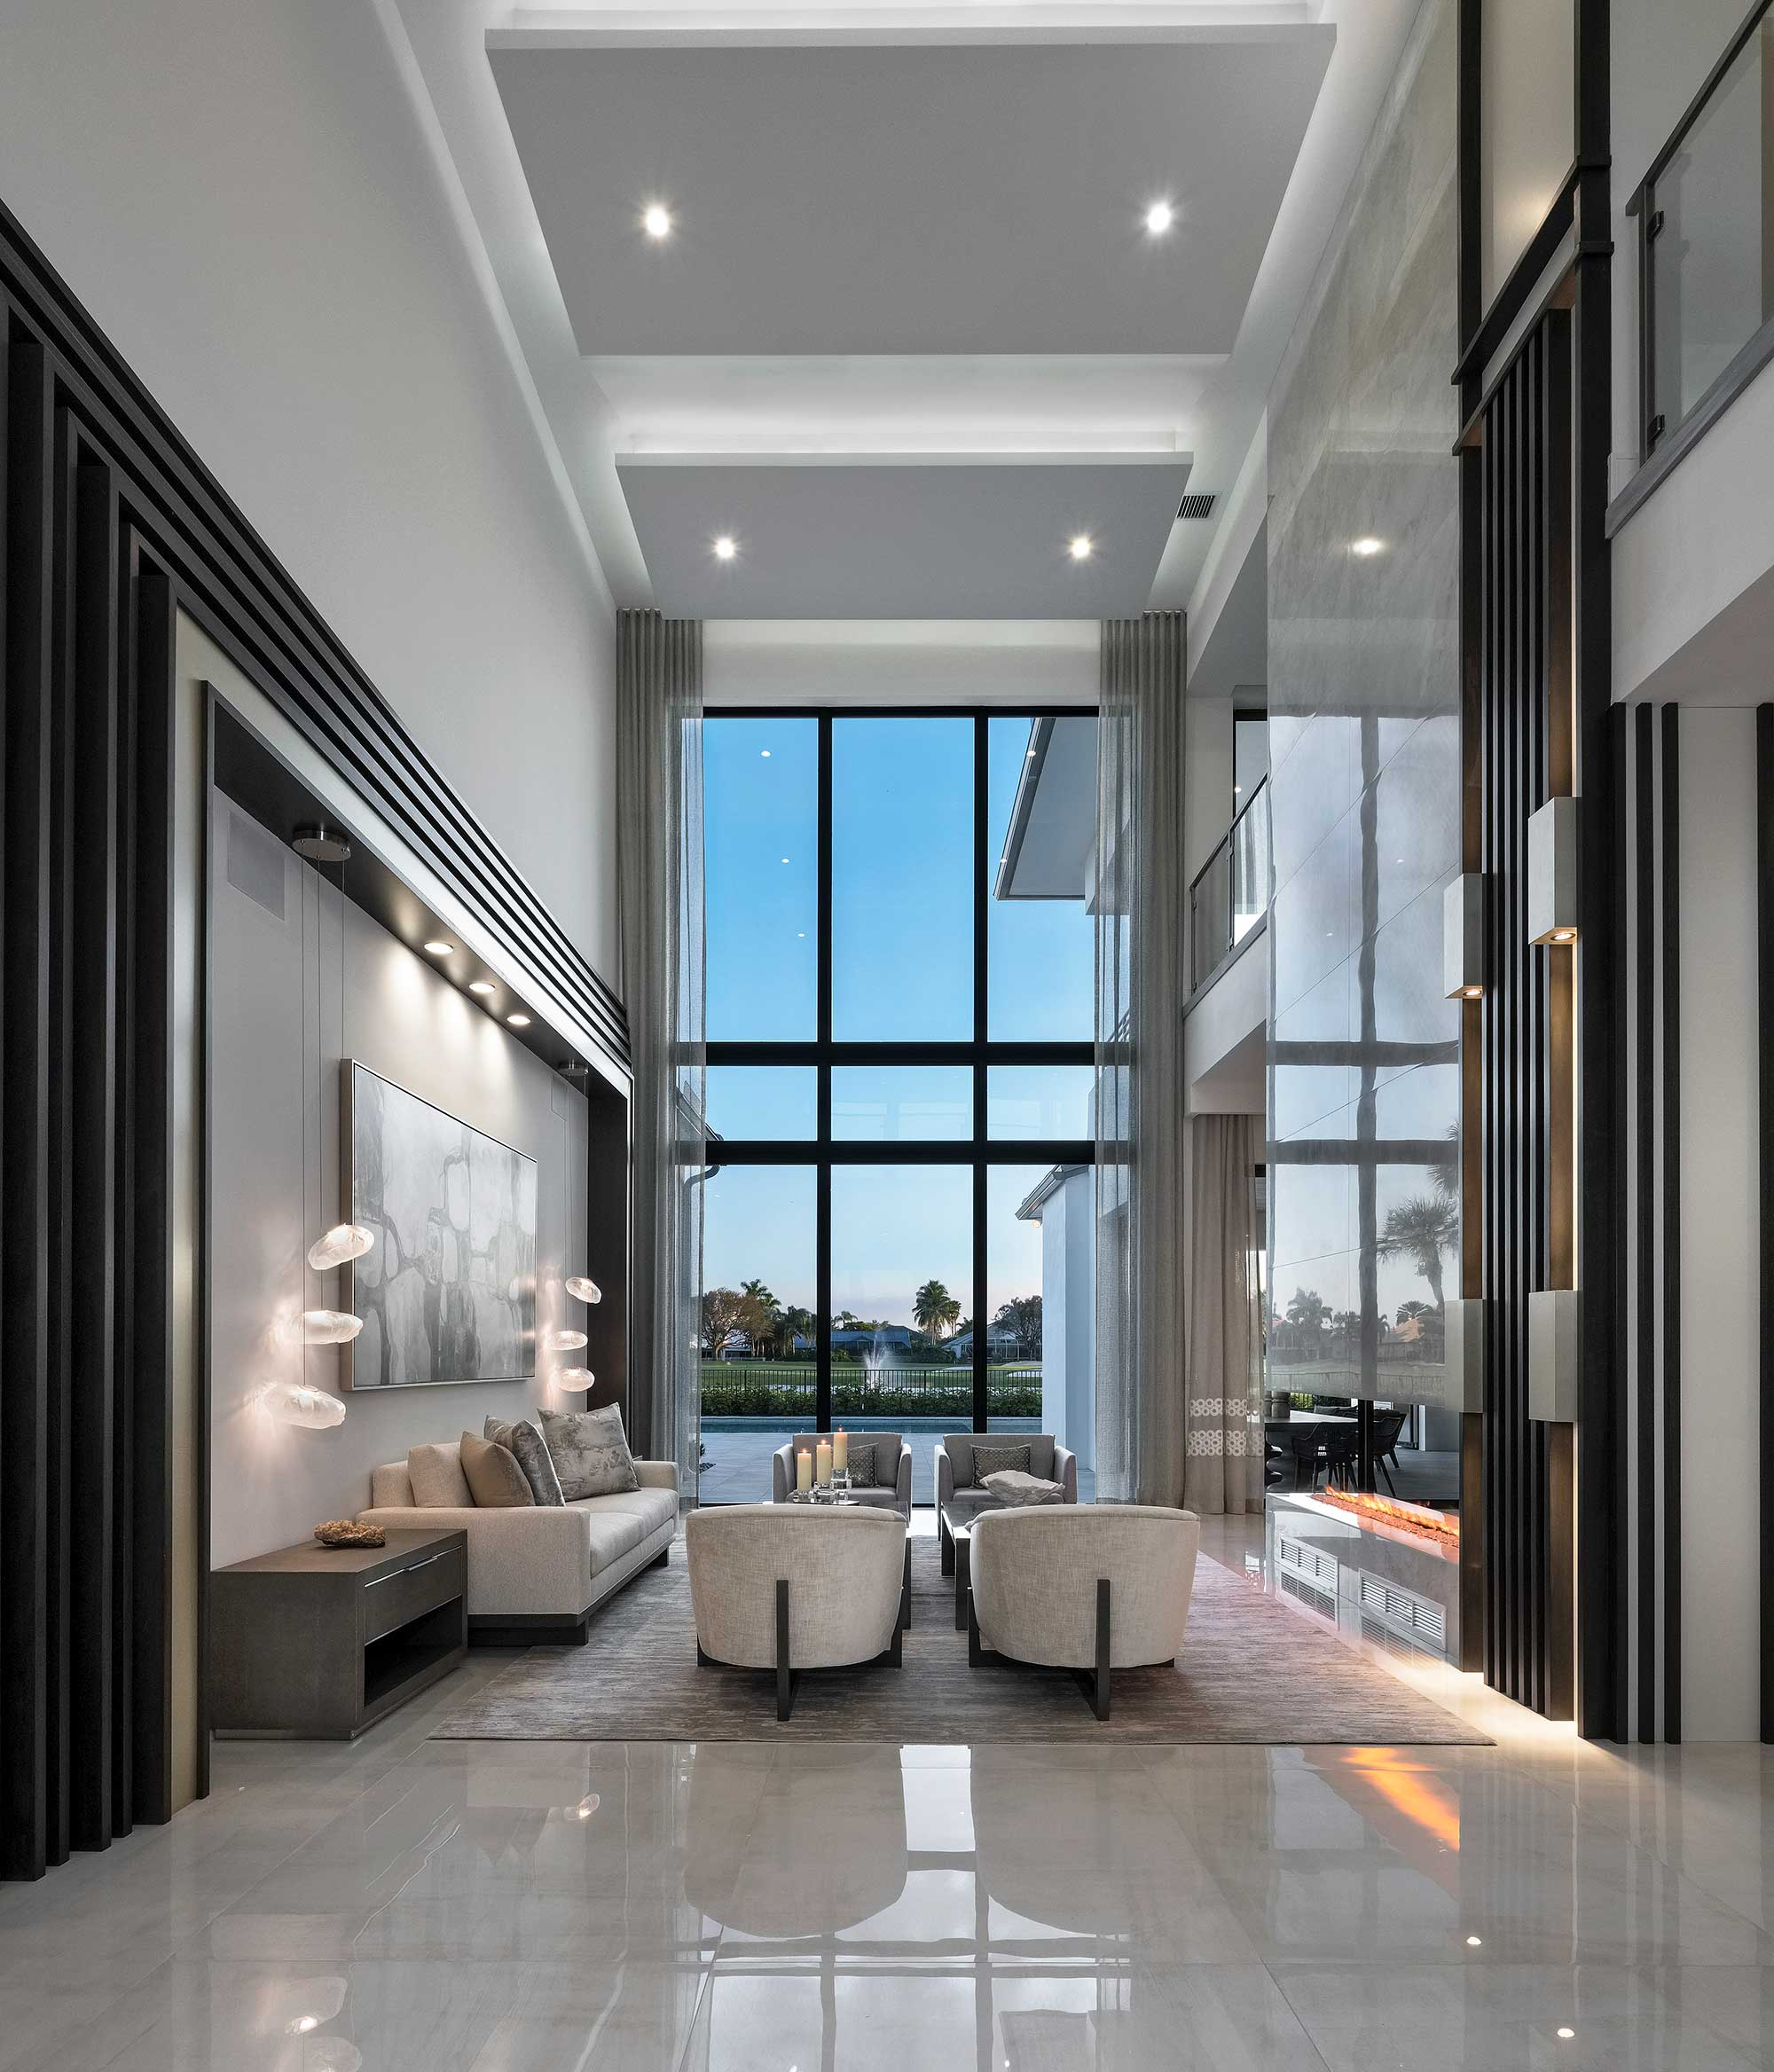 Coconut Creek home lounge area with tall impact windows